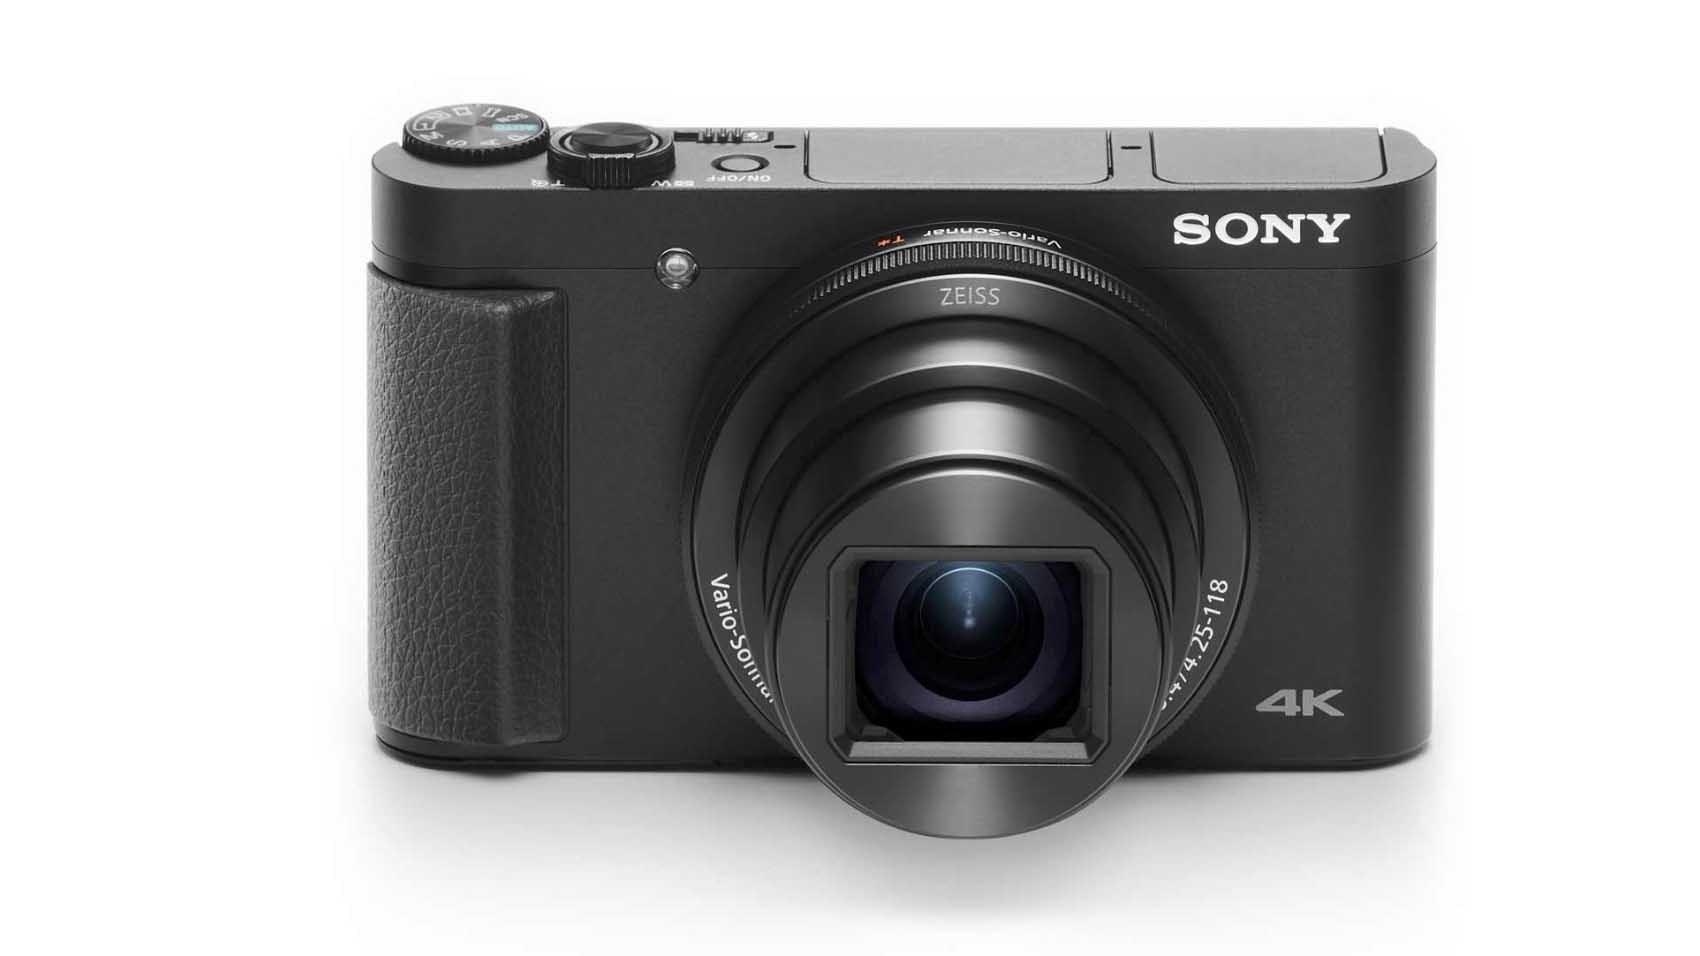 Sony Cybershot DSC-HX99, DSC-HX95